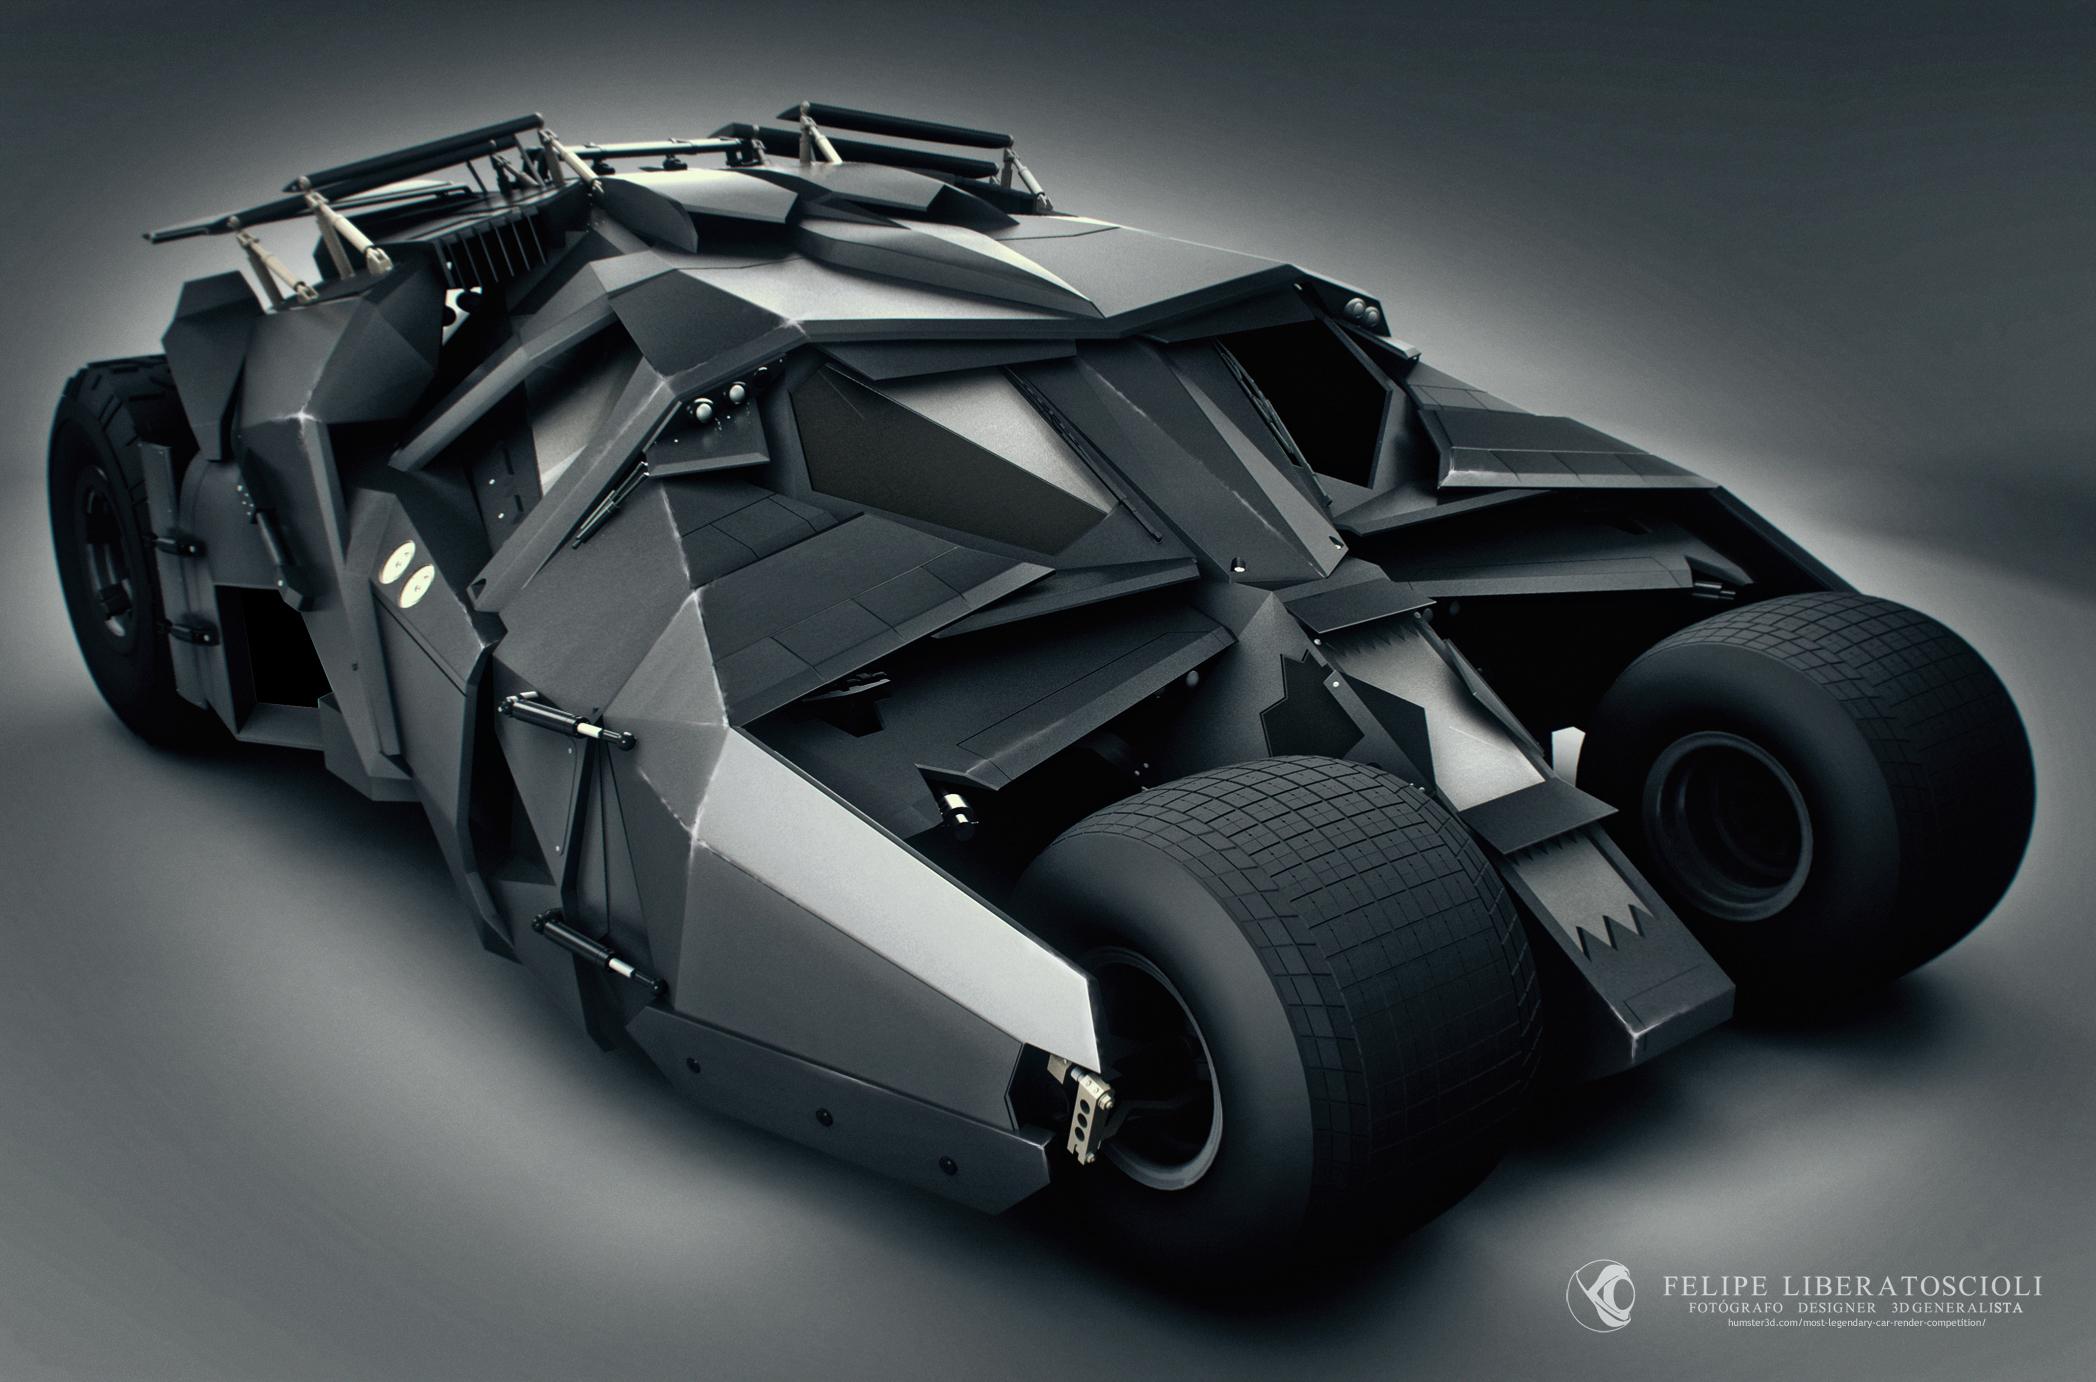 The Tumbler Batmobile 3d art